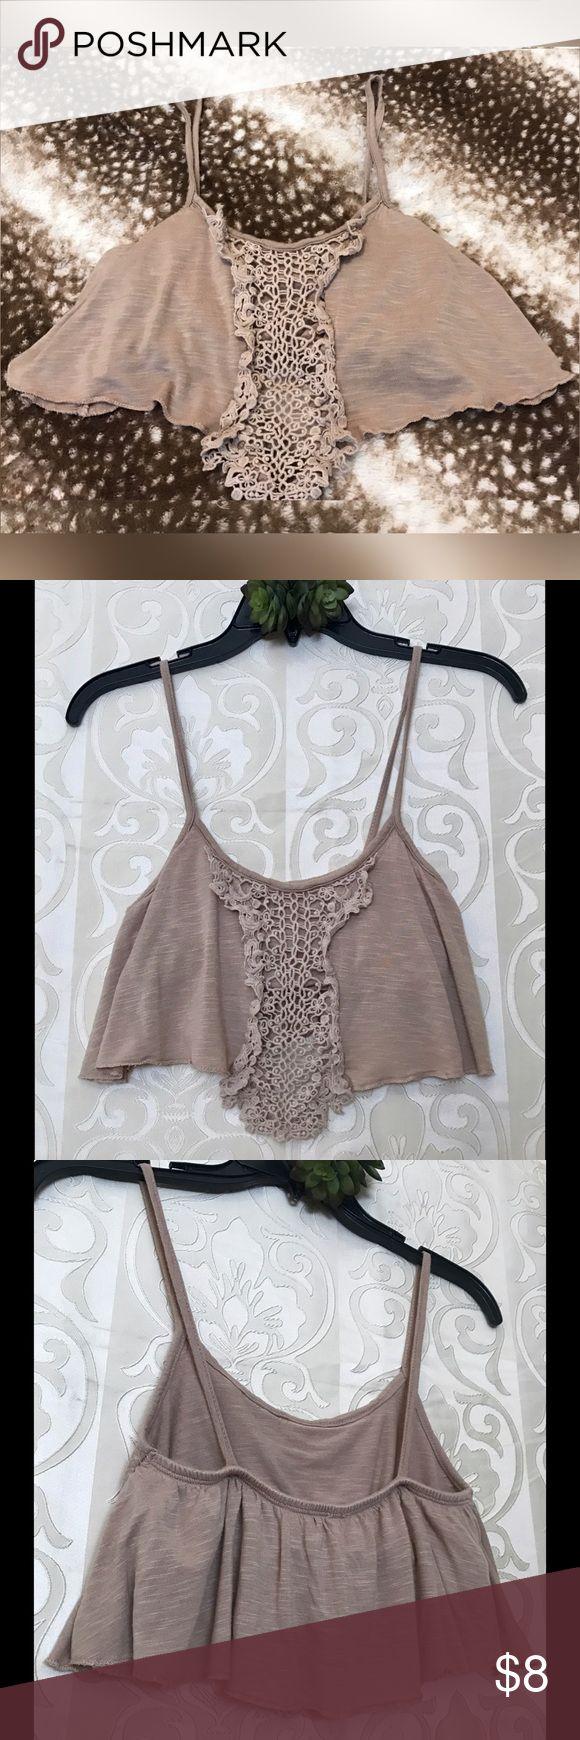 Crochet Crop Top Cute dark cream crop top with front crochet design. Top has spaghetti straps and also has a built in bra. Tops Crop Tops